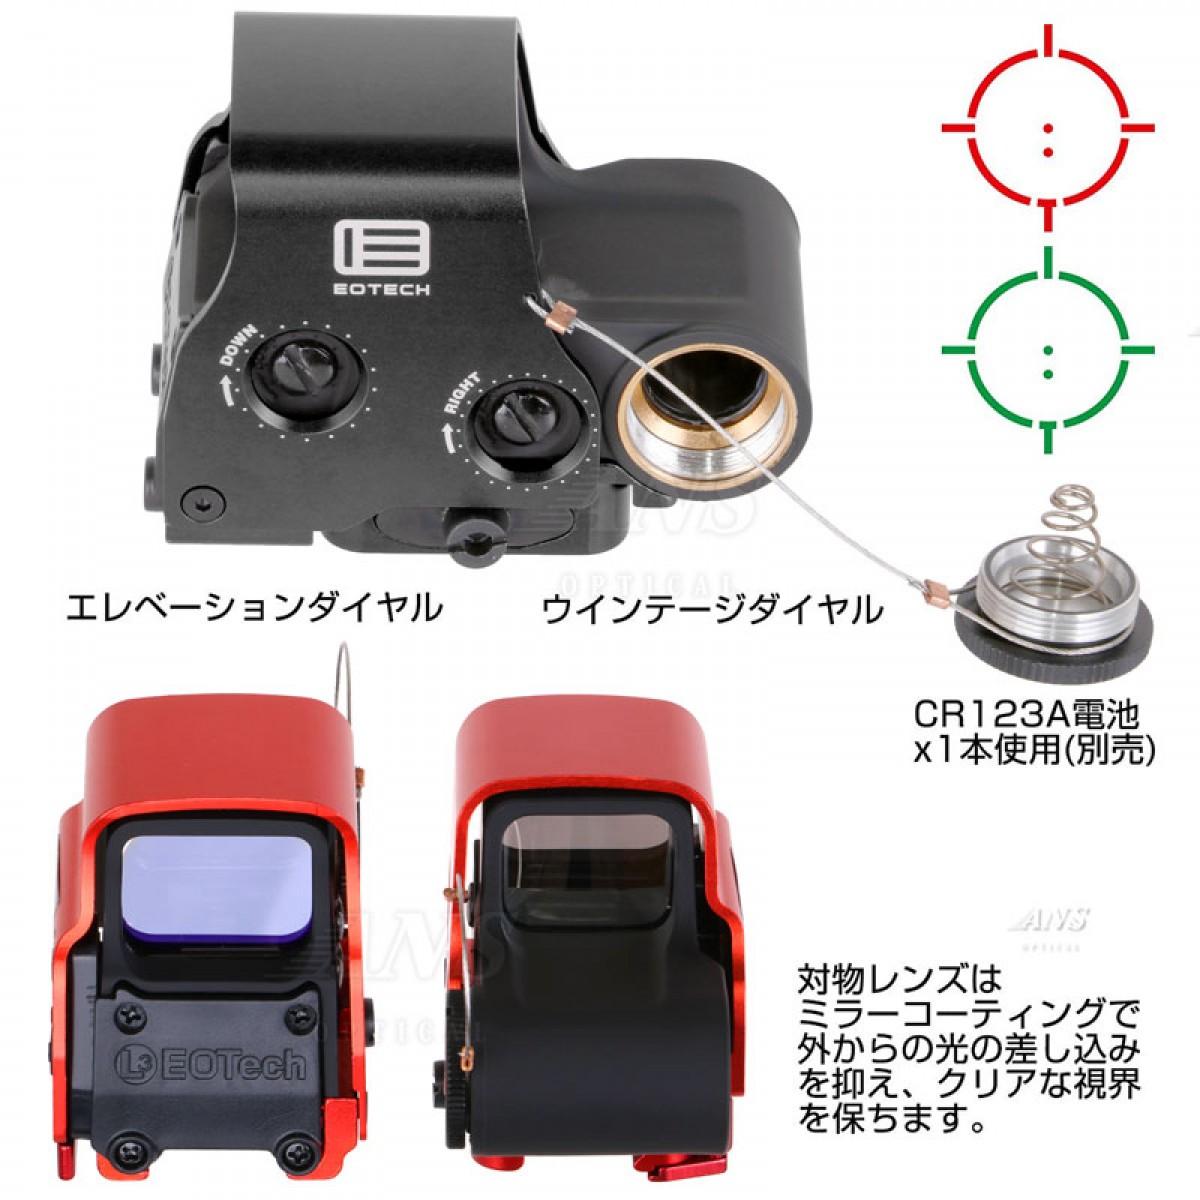 ANS optical Eo 558タイプドットサイト サイドボタン QDレバー (BK/RD)